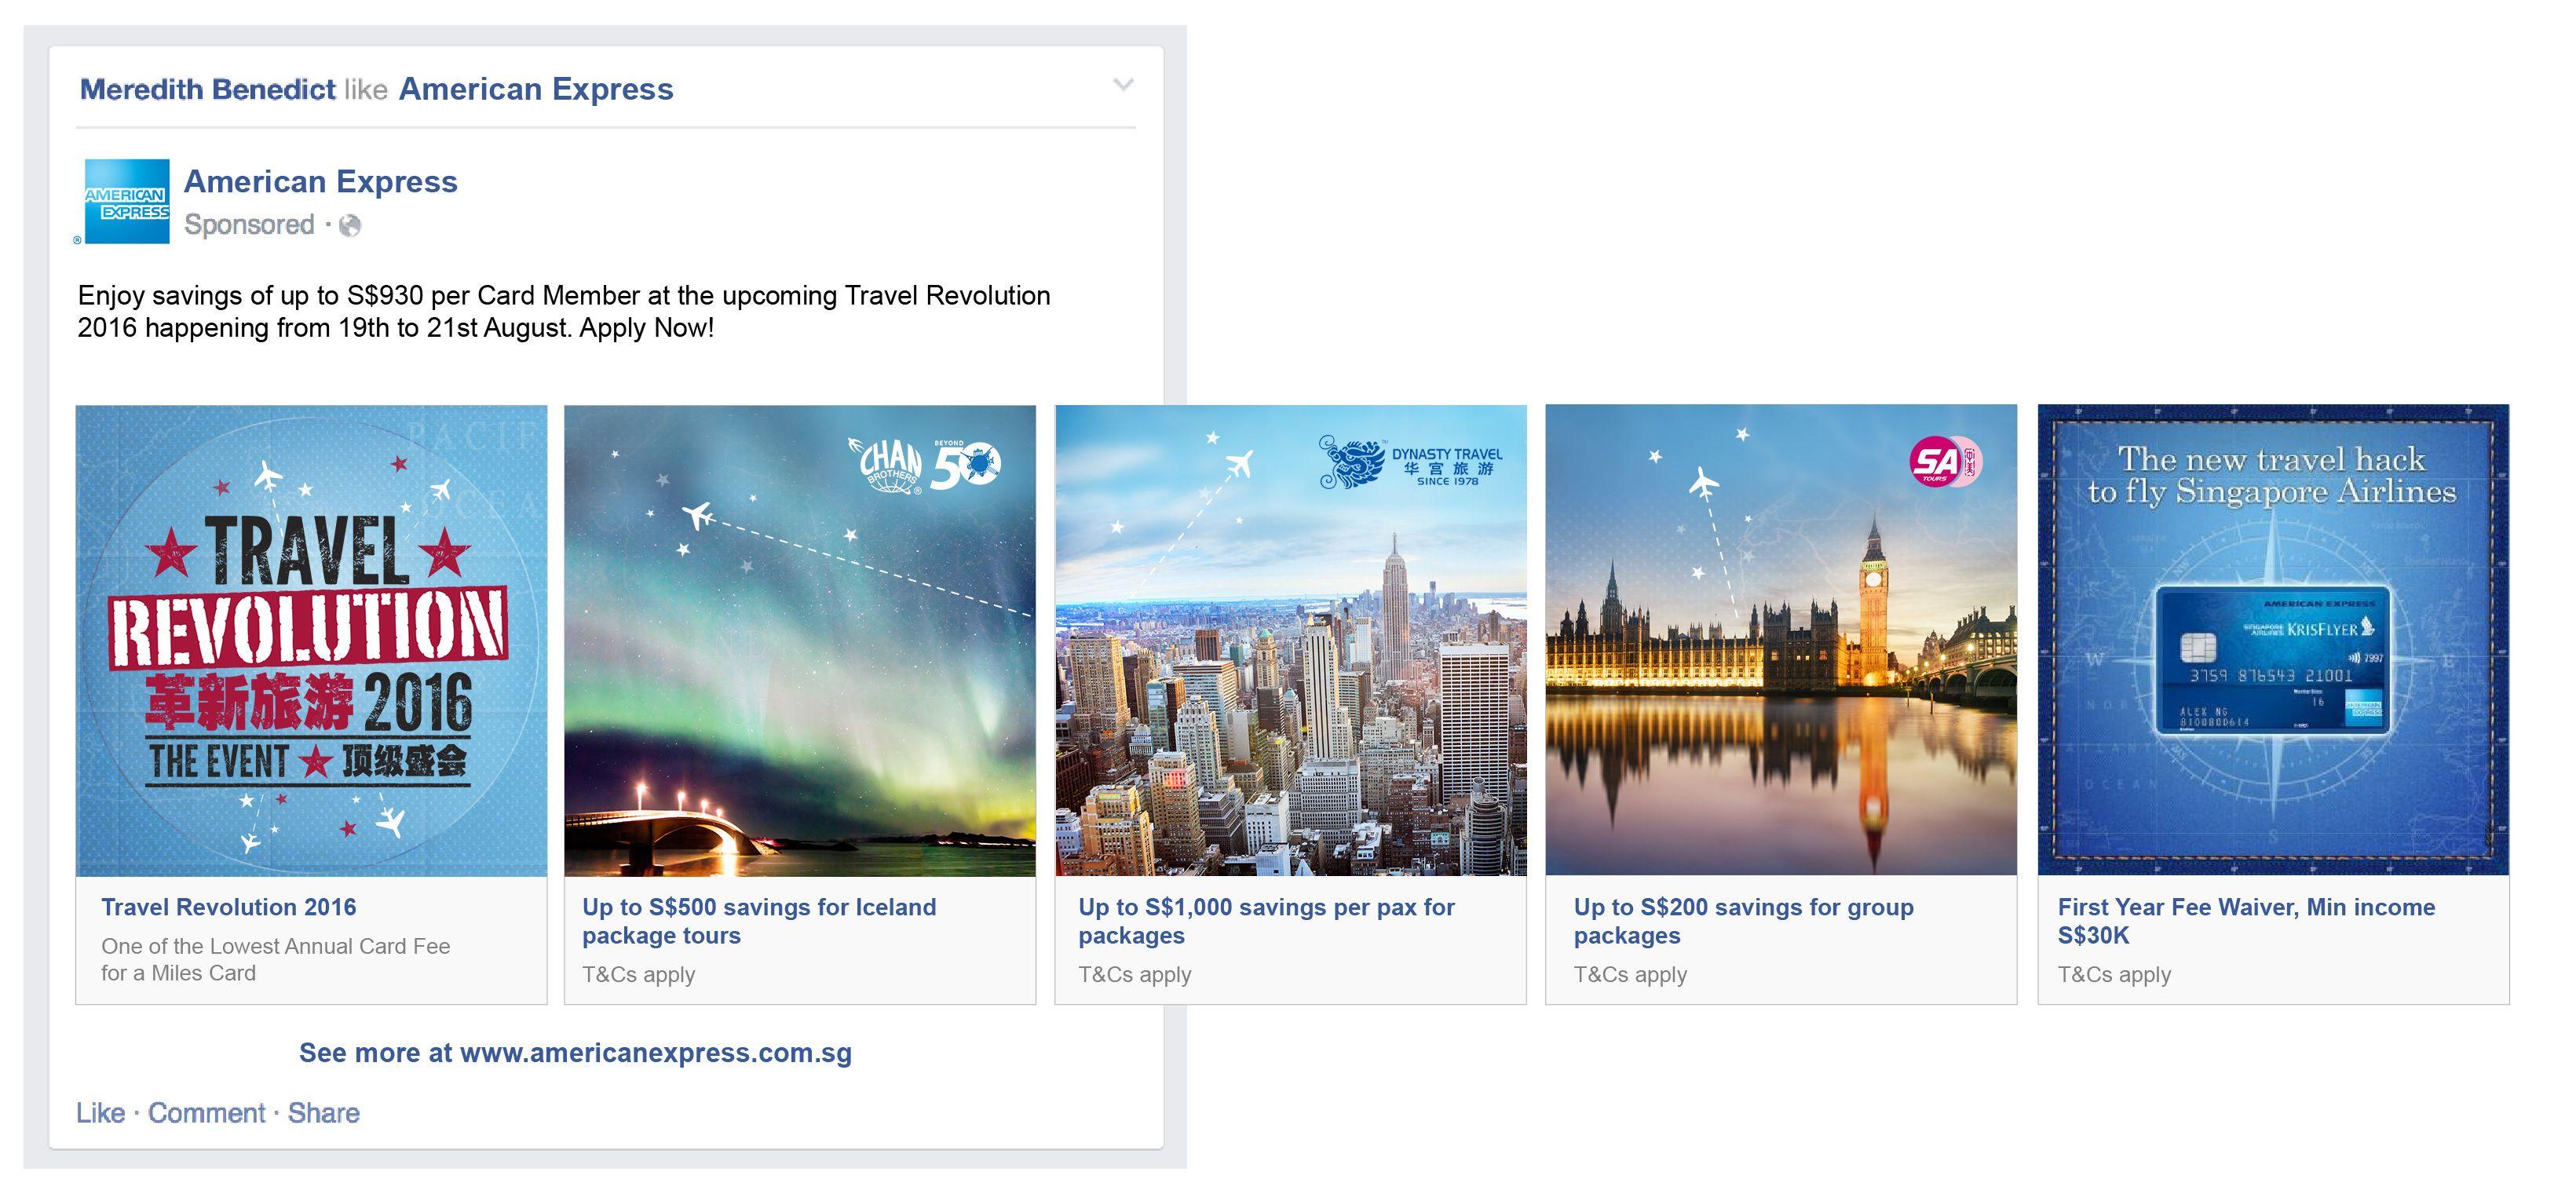 Ali Hanafiah Amex Facebook Carousel Ads Facebook Carousel Ads Ads Travel Ads